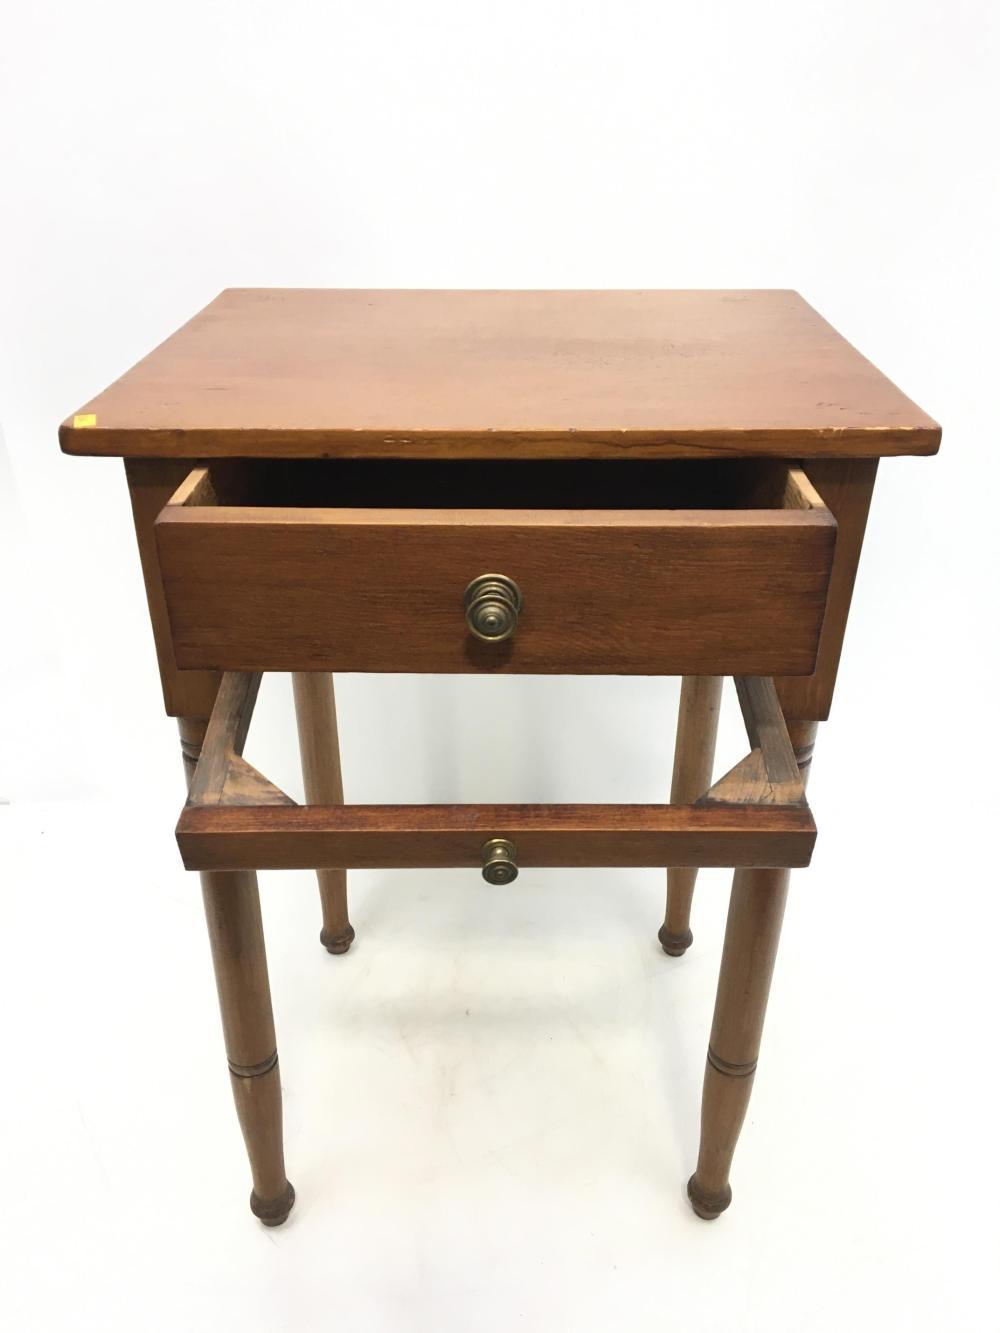 Antique Sheraton Period Work Table